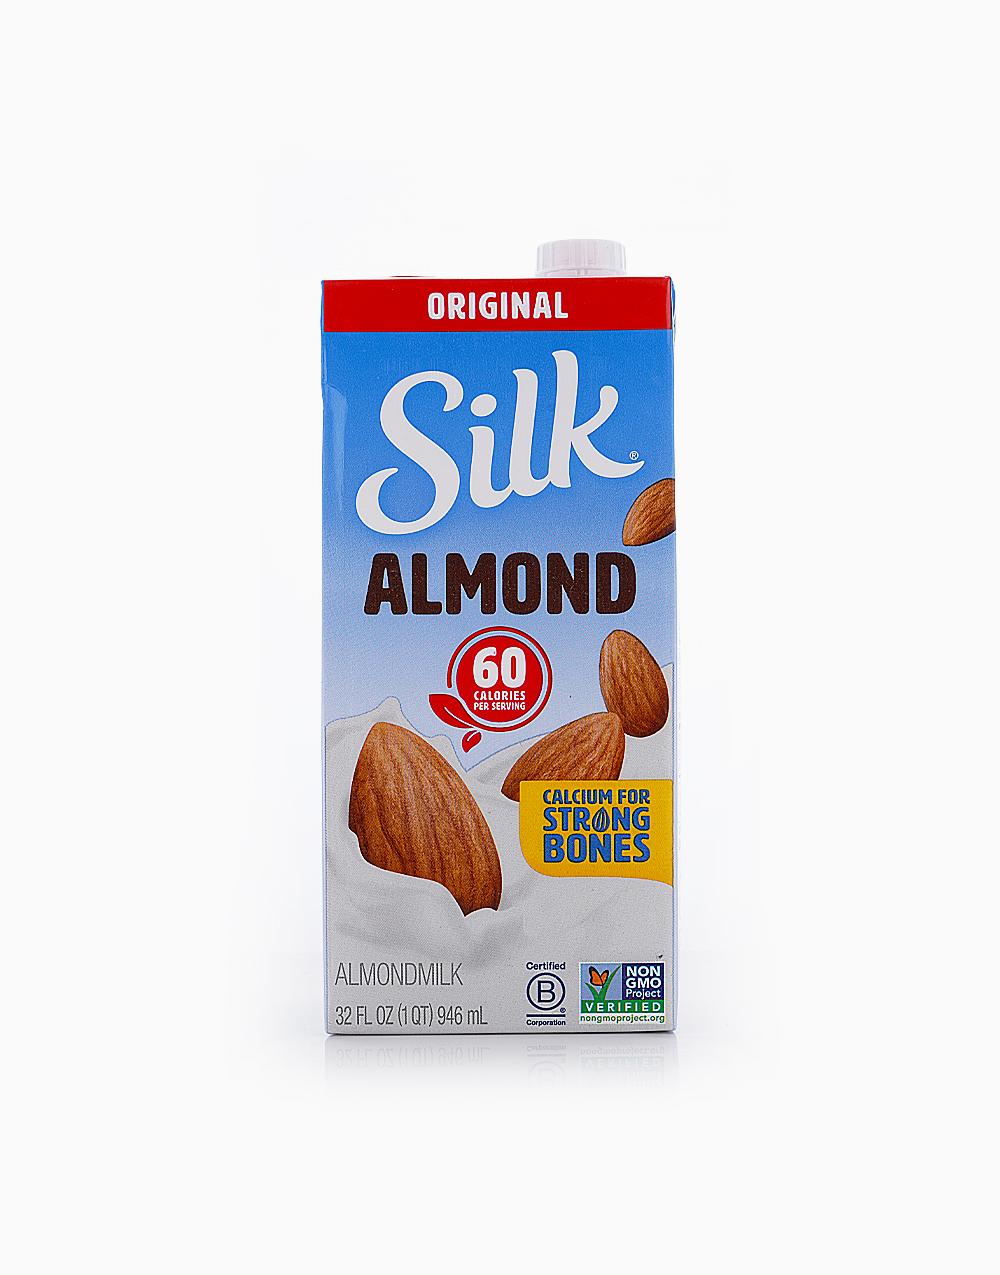 Silk Almond Milk Original (946ml) by Silk